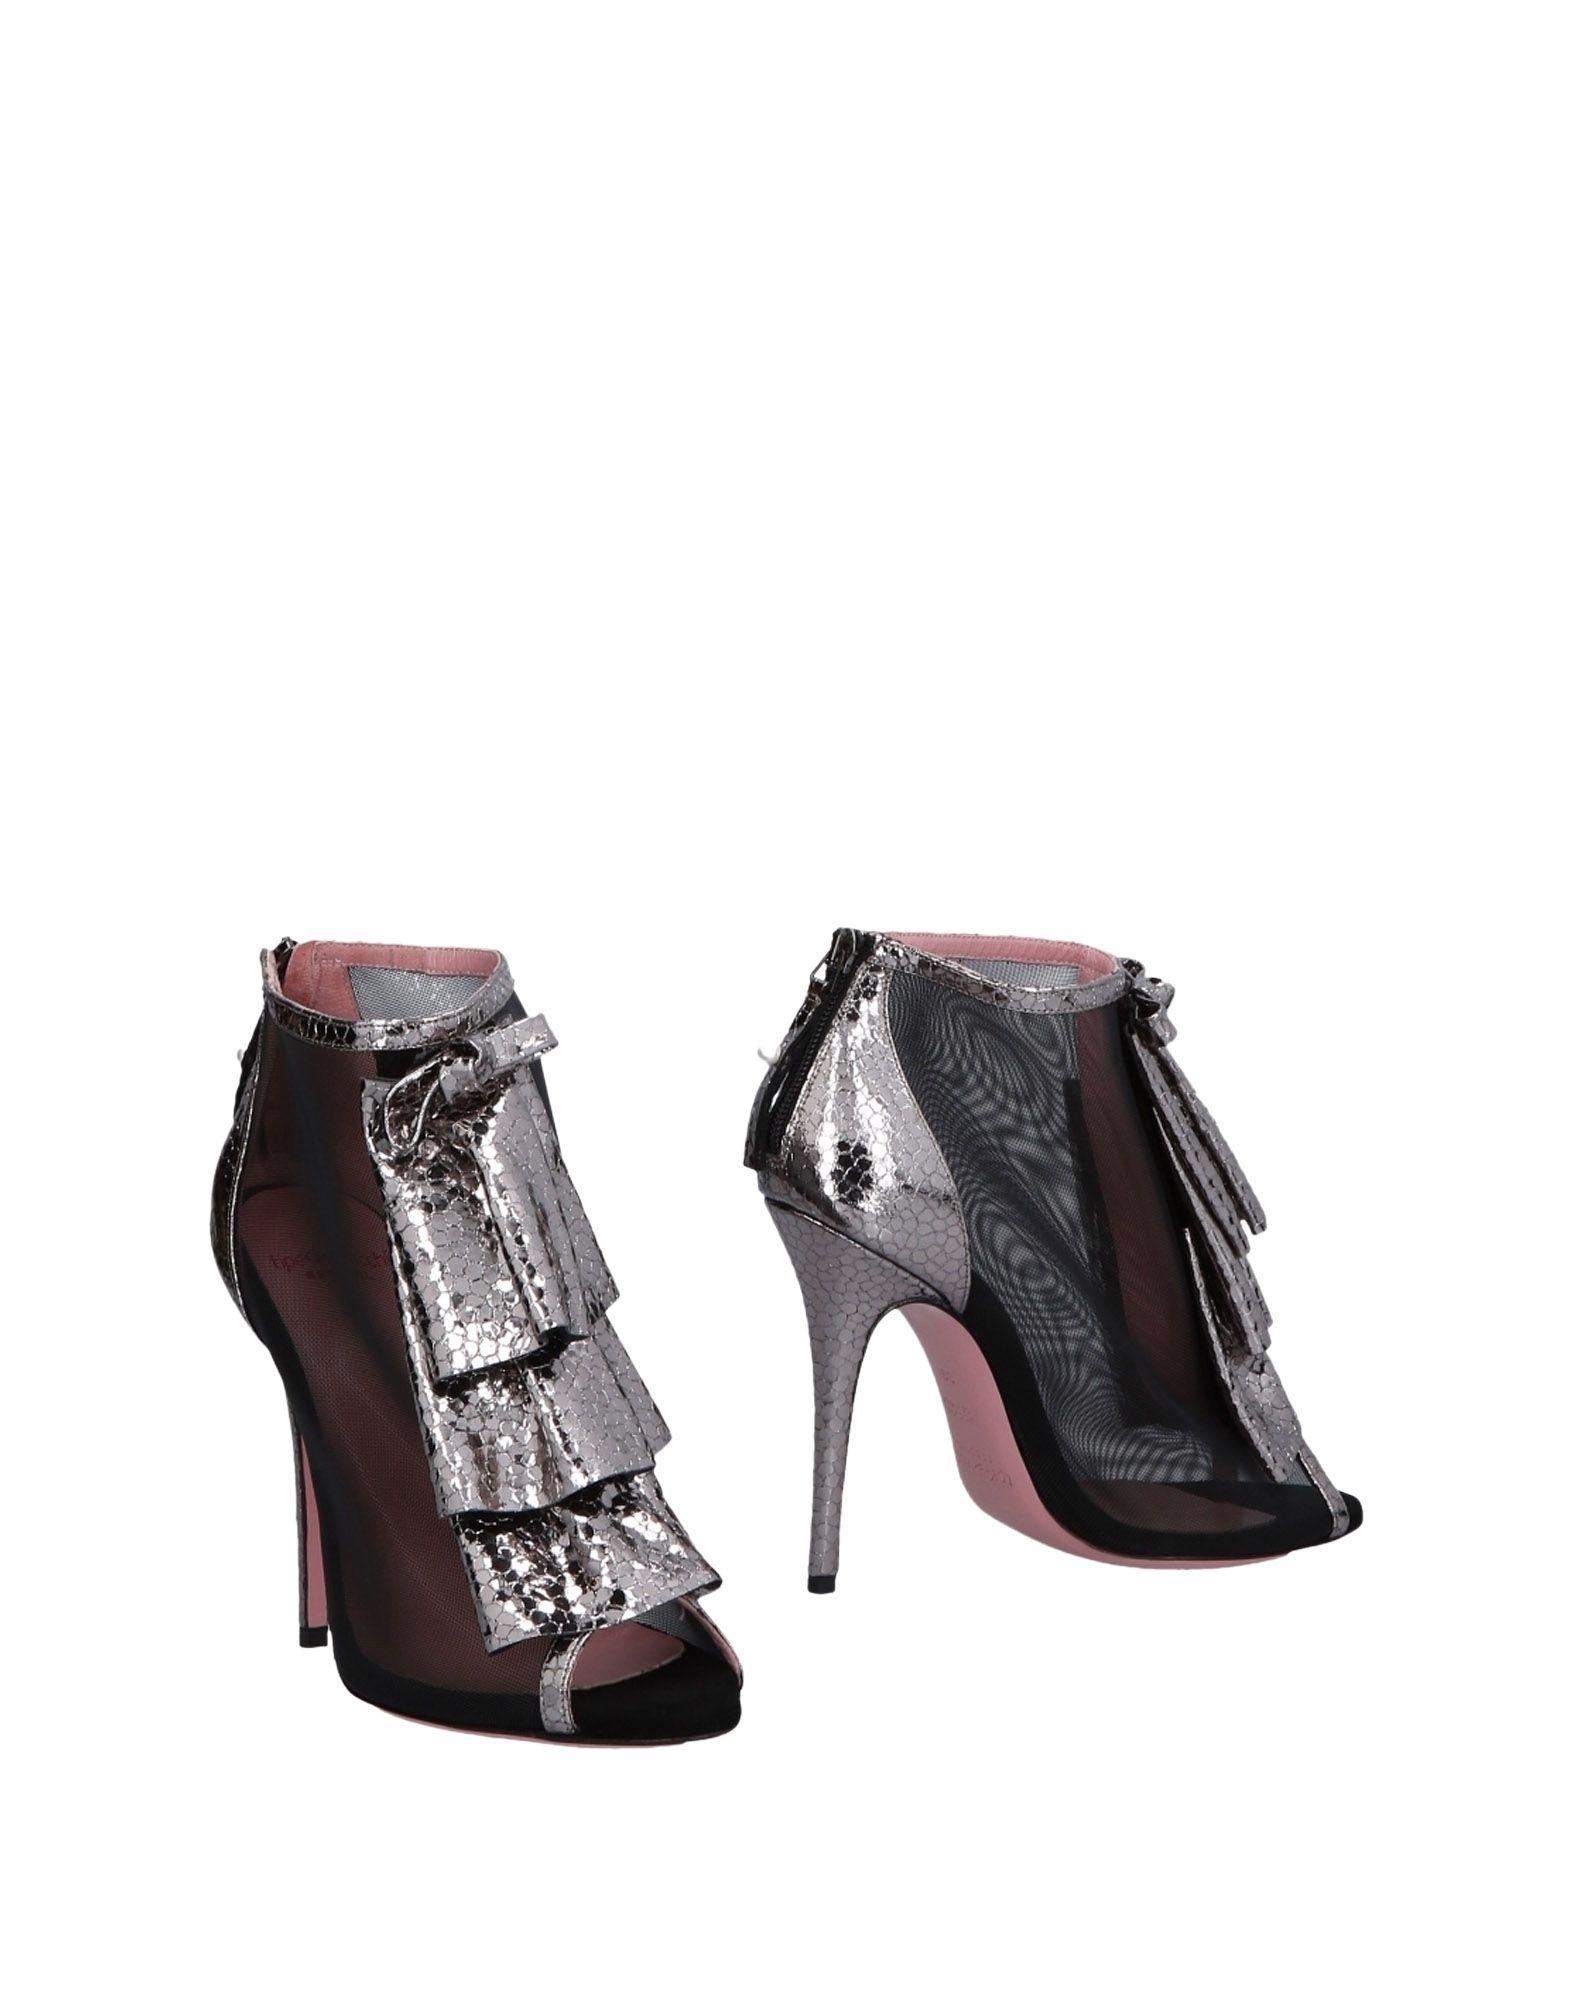 Tipe E Tacchi Stiefelette Damen  11479703KRGut aussehende strapazierfähige Schuhe